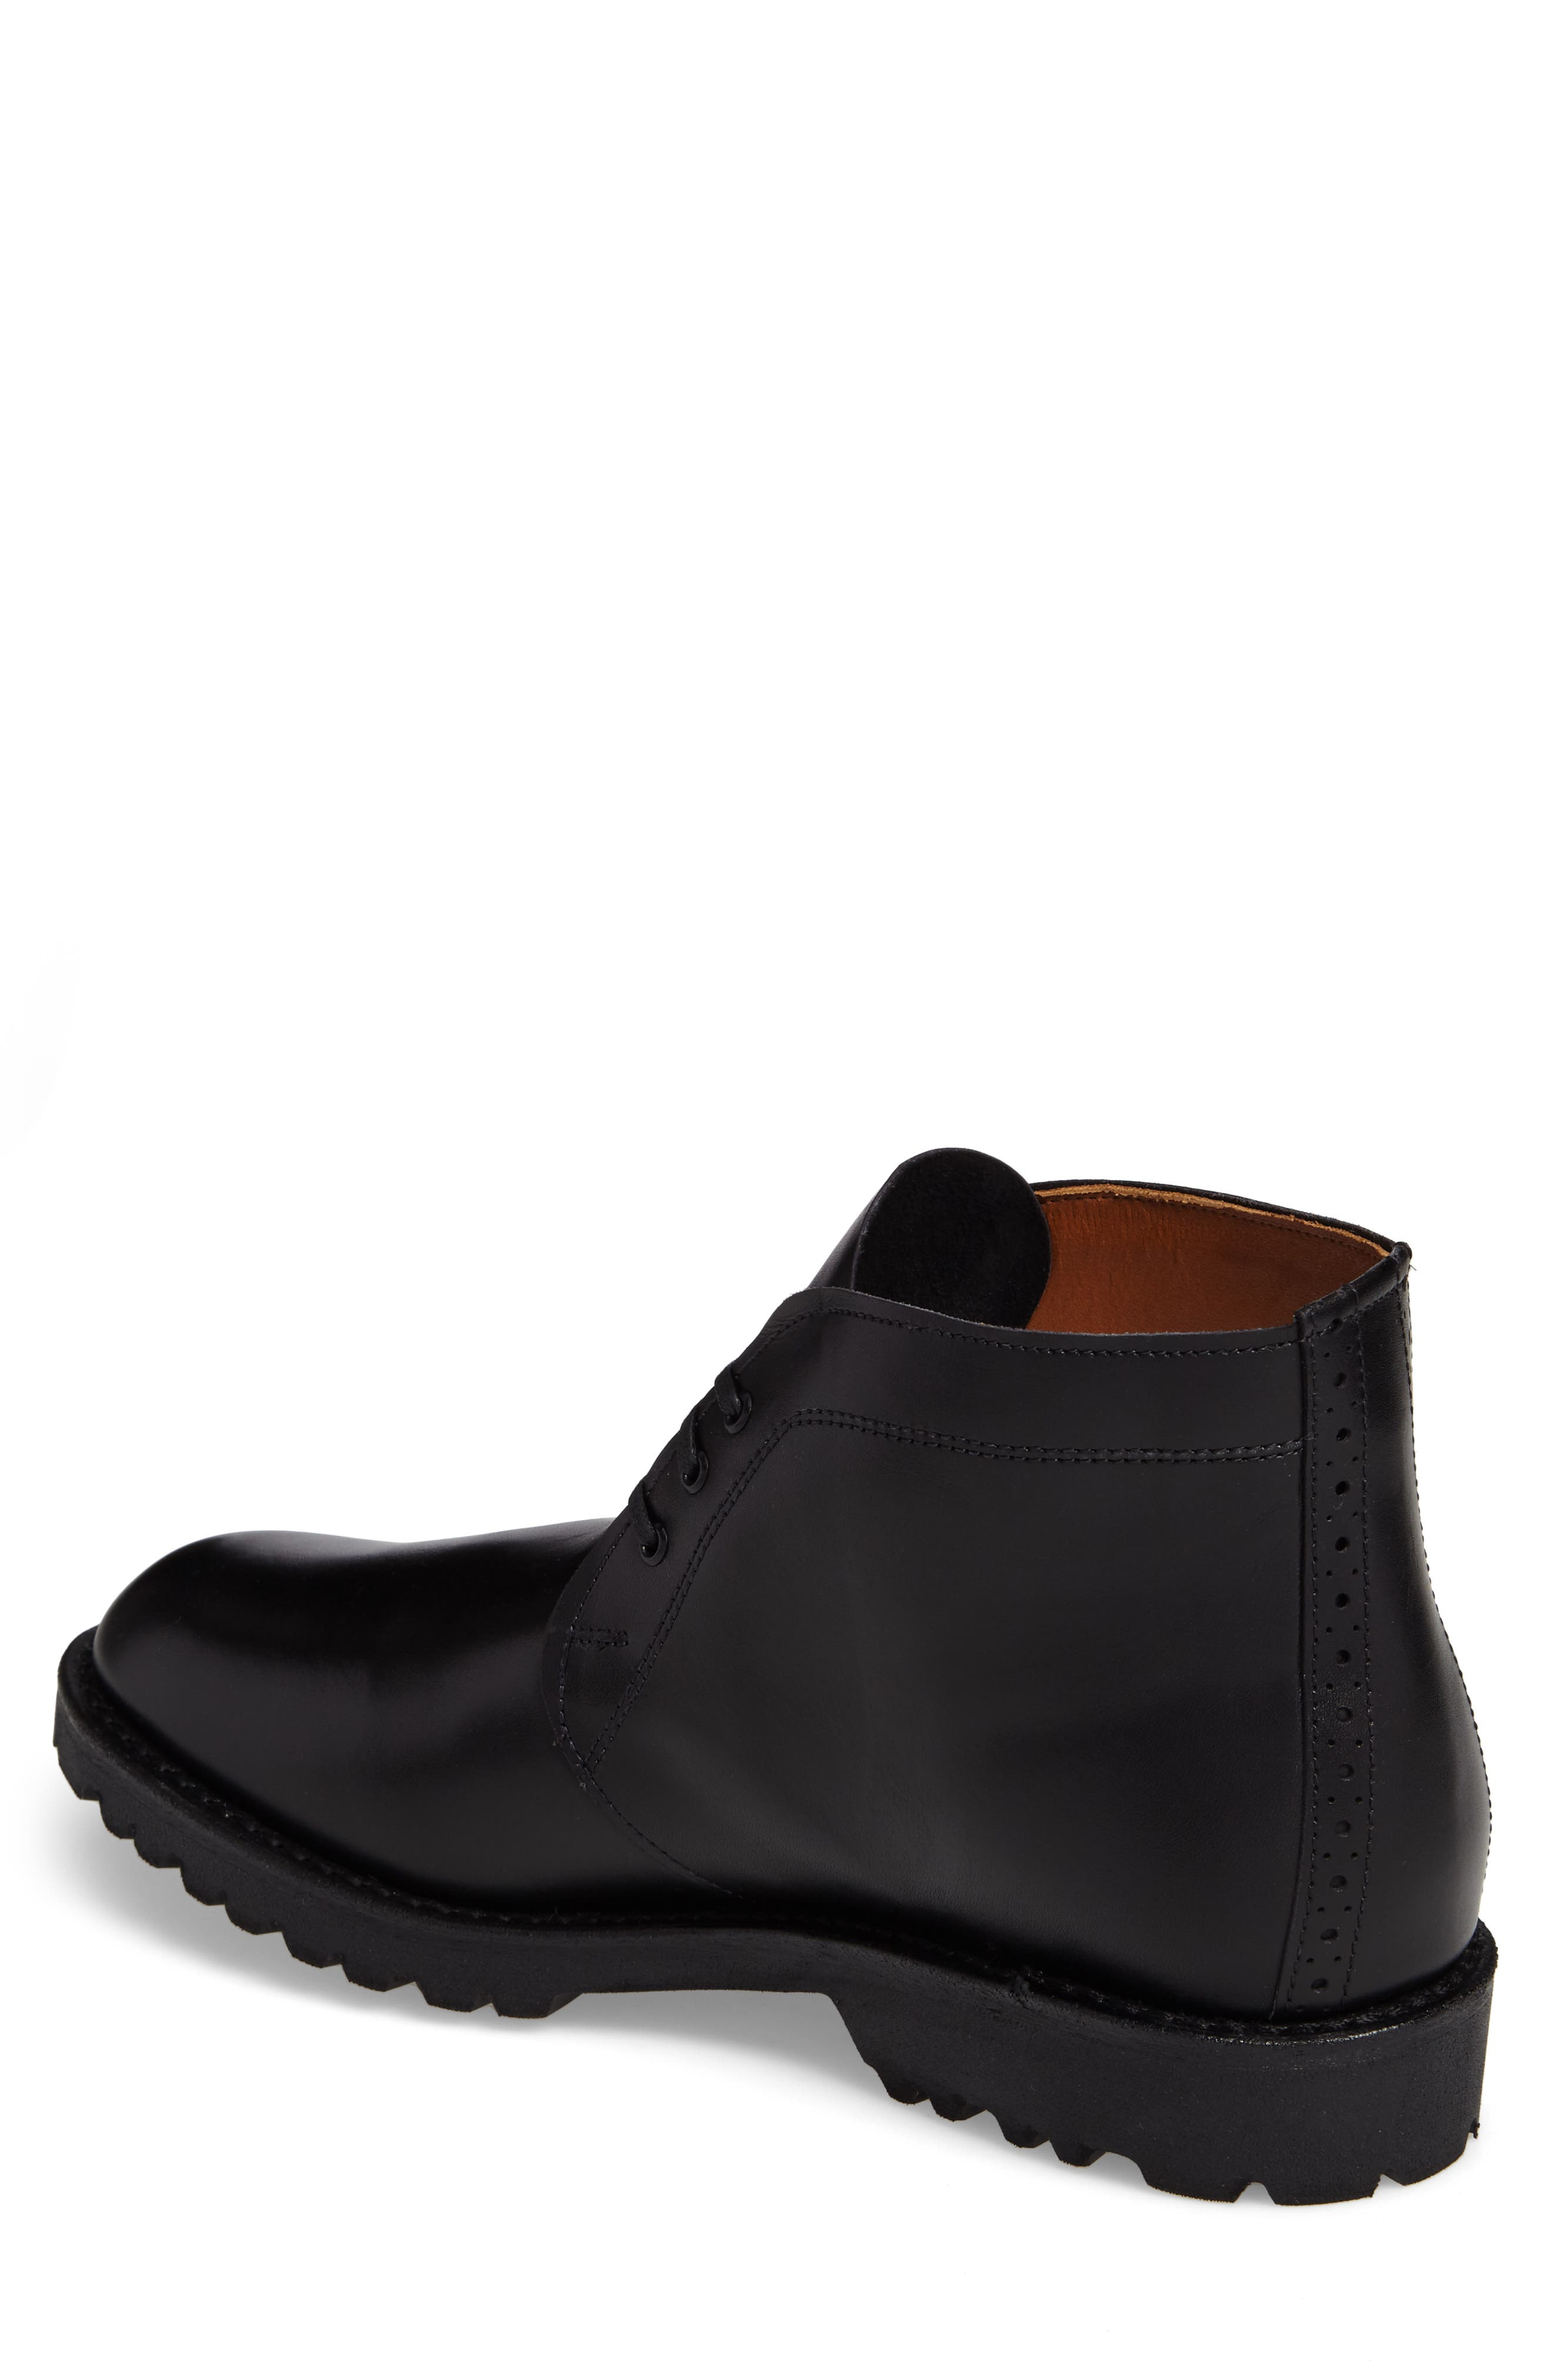 Tate Chukka Boot,                             Alternate thumbnail 2, color,                             Black Leather